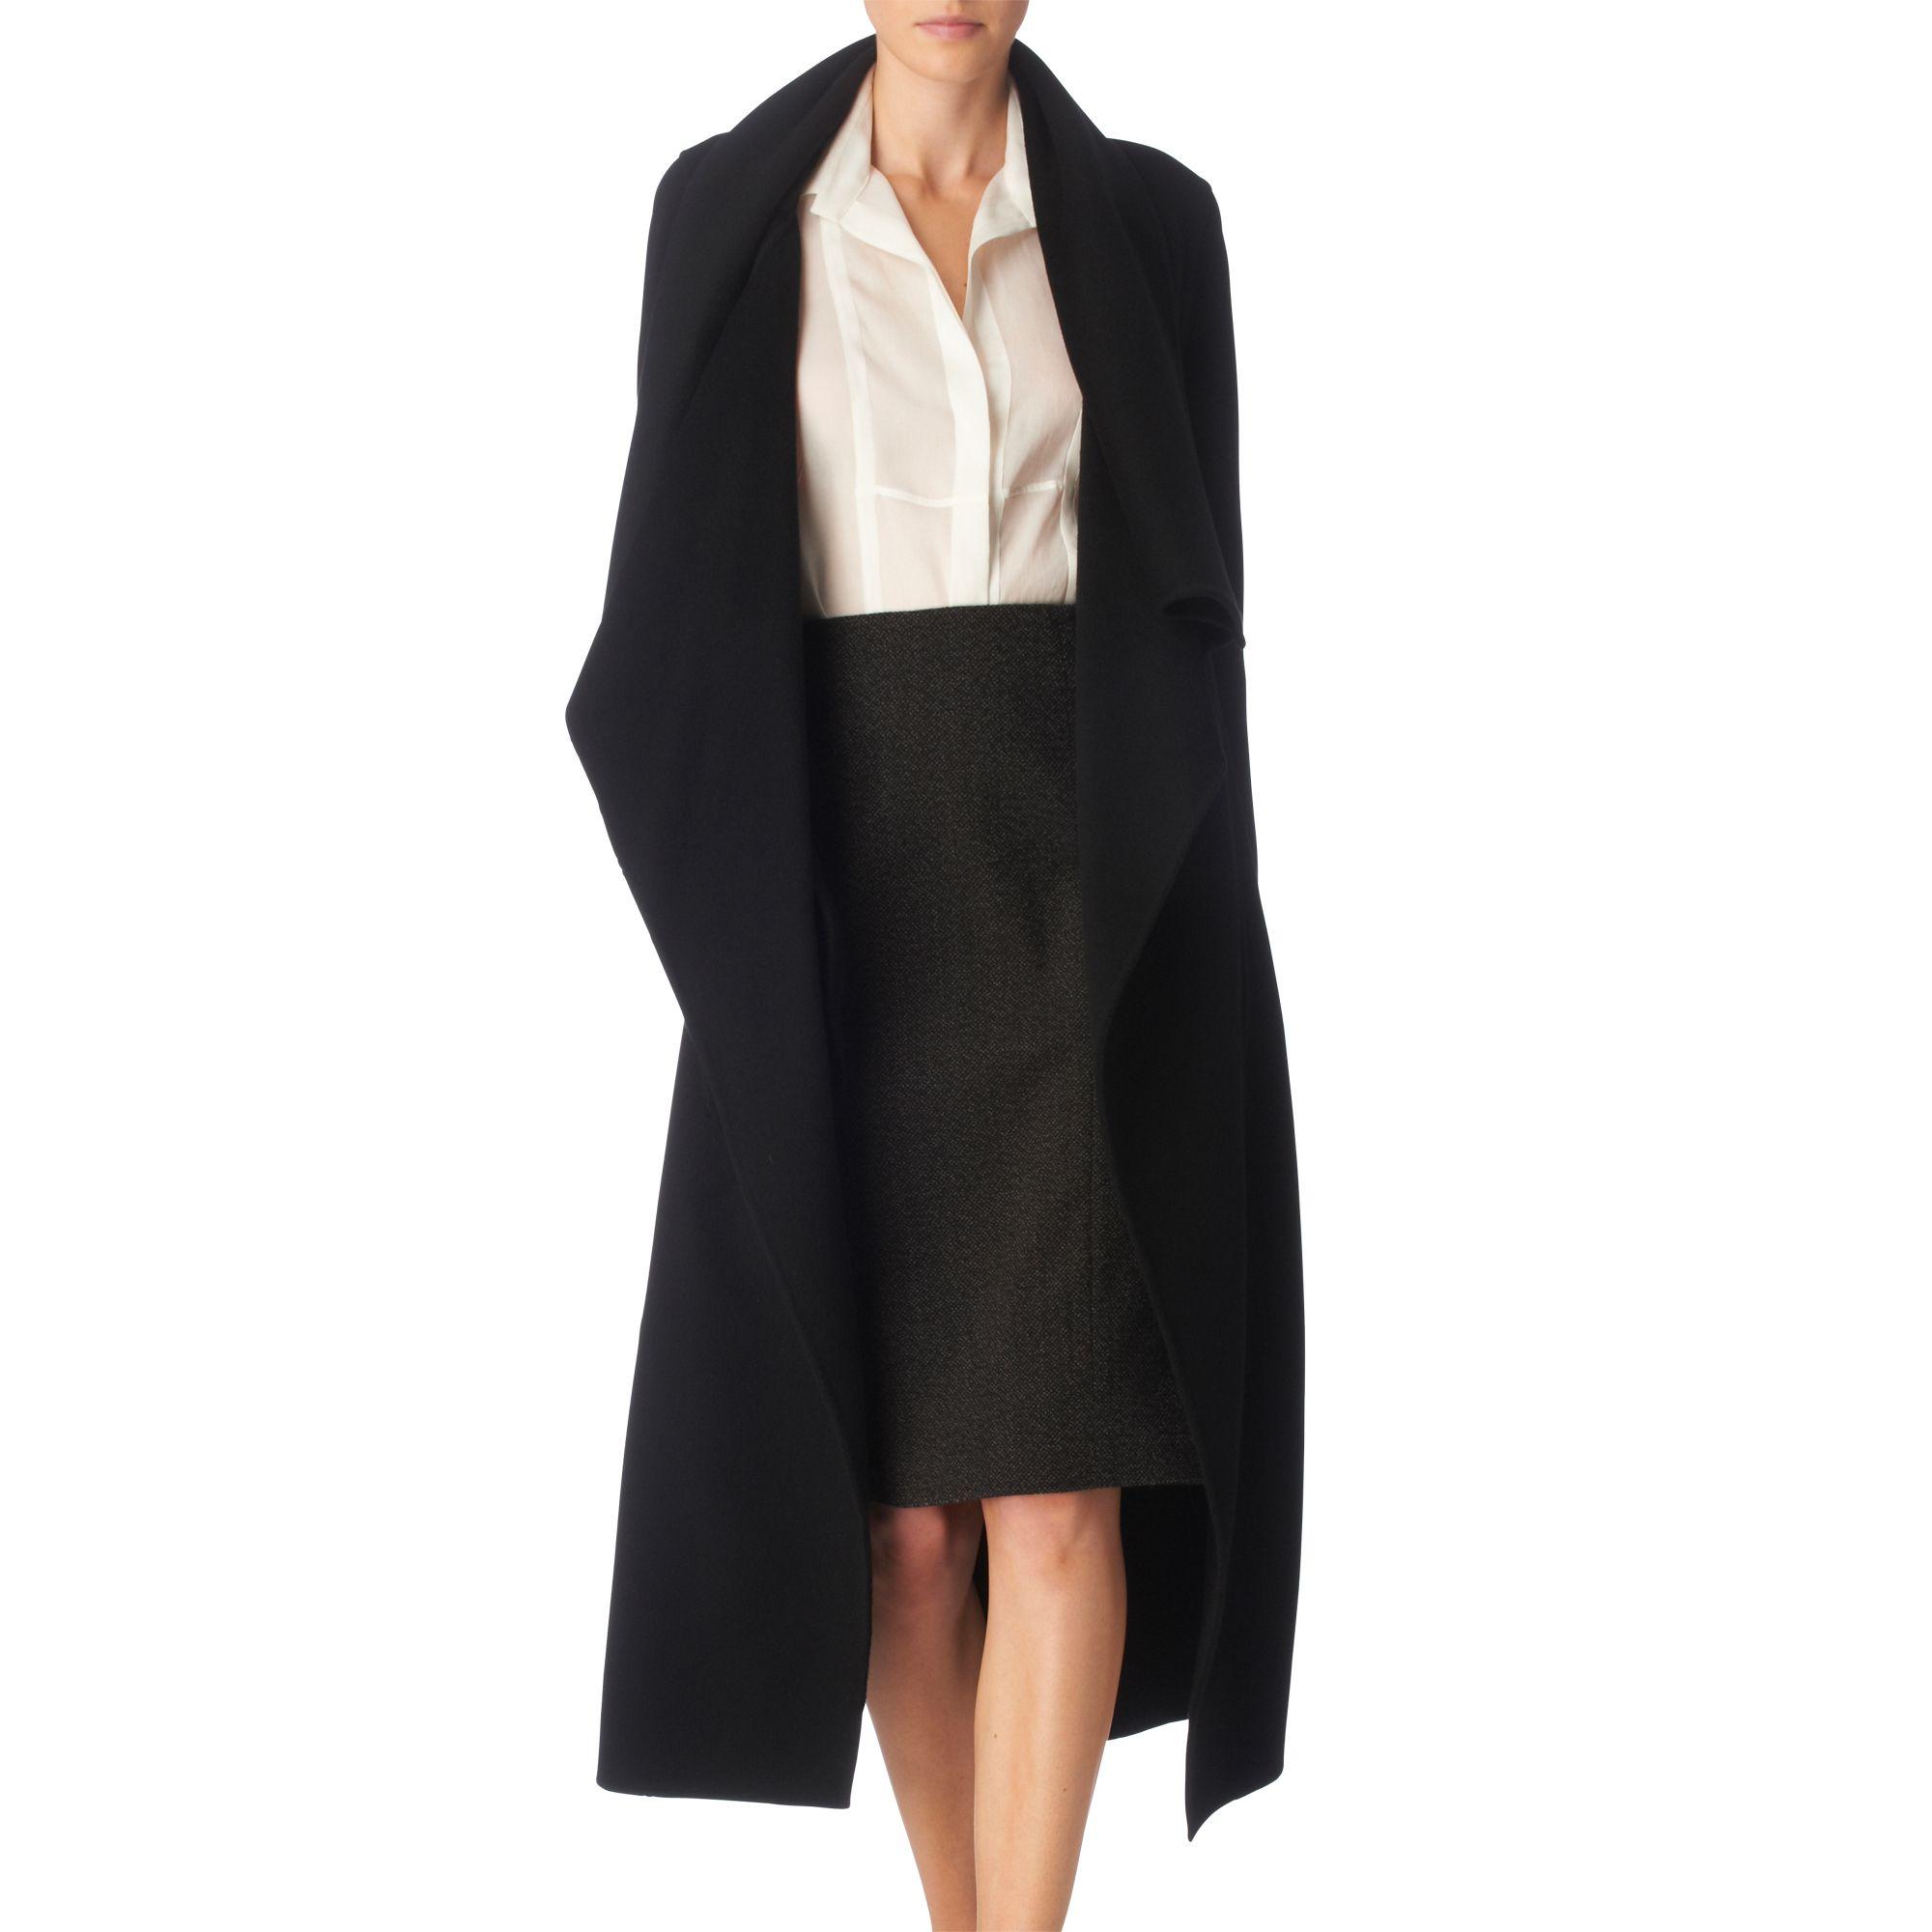 Donna karan Draped Cashmere Coat in Black | Lyst